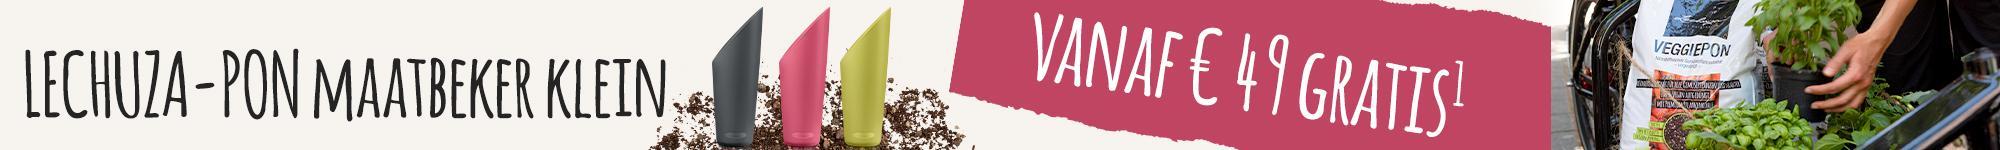 PON maatbeker klein vanaf € 49 gratis